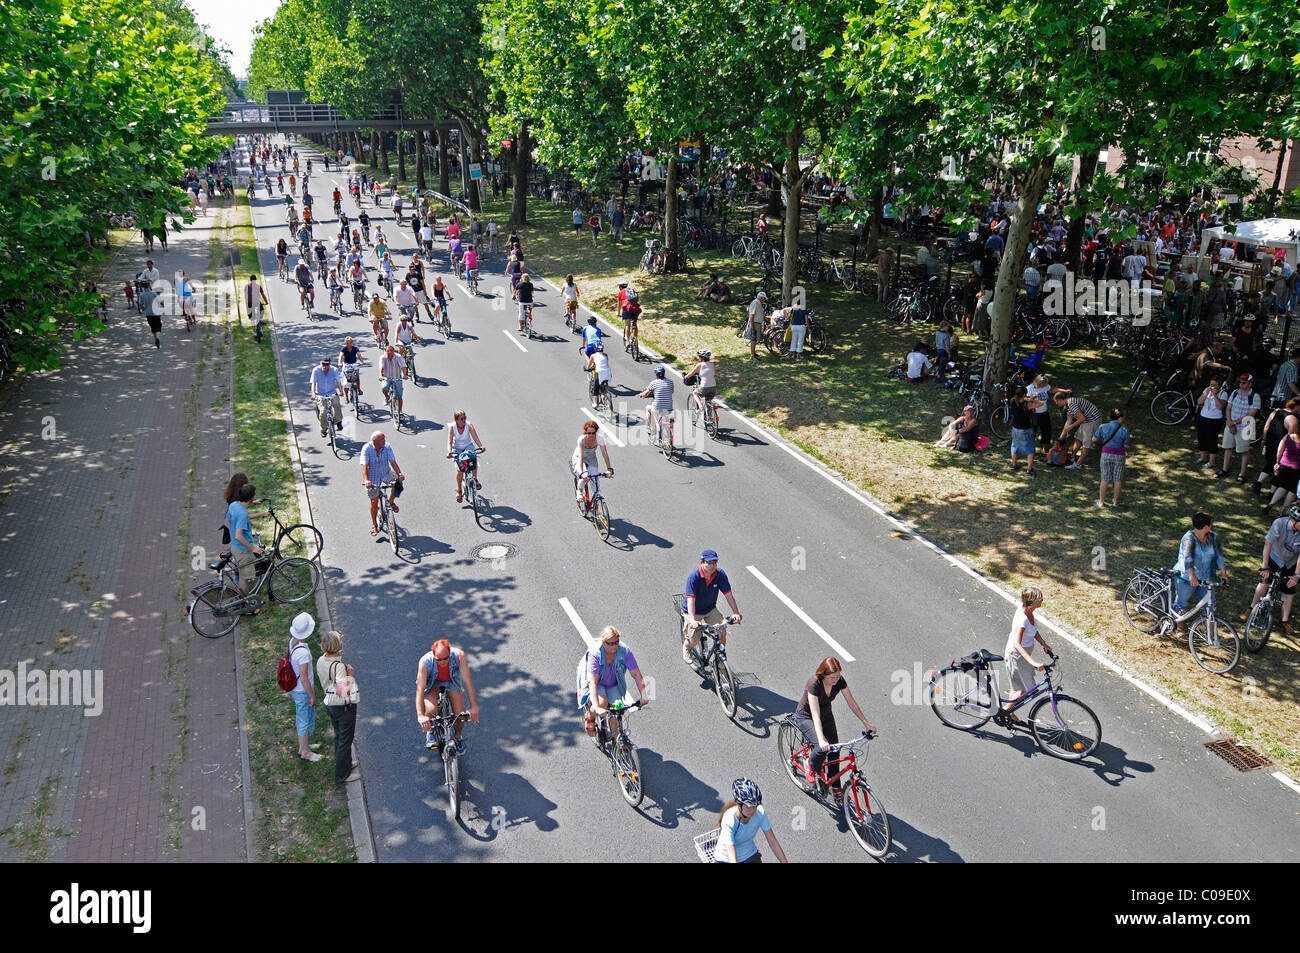 Radfahrer, Still-Leben Ruhrschnellweg, B1, A 40 Autobahn, Autobahn gesperrt für Autos, Kunstevent, Hauptstadt Stockbild